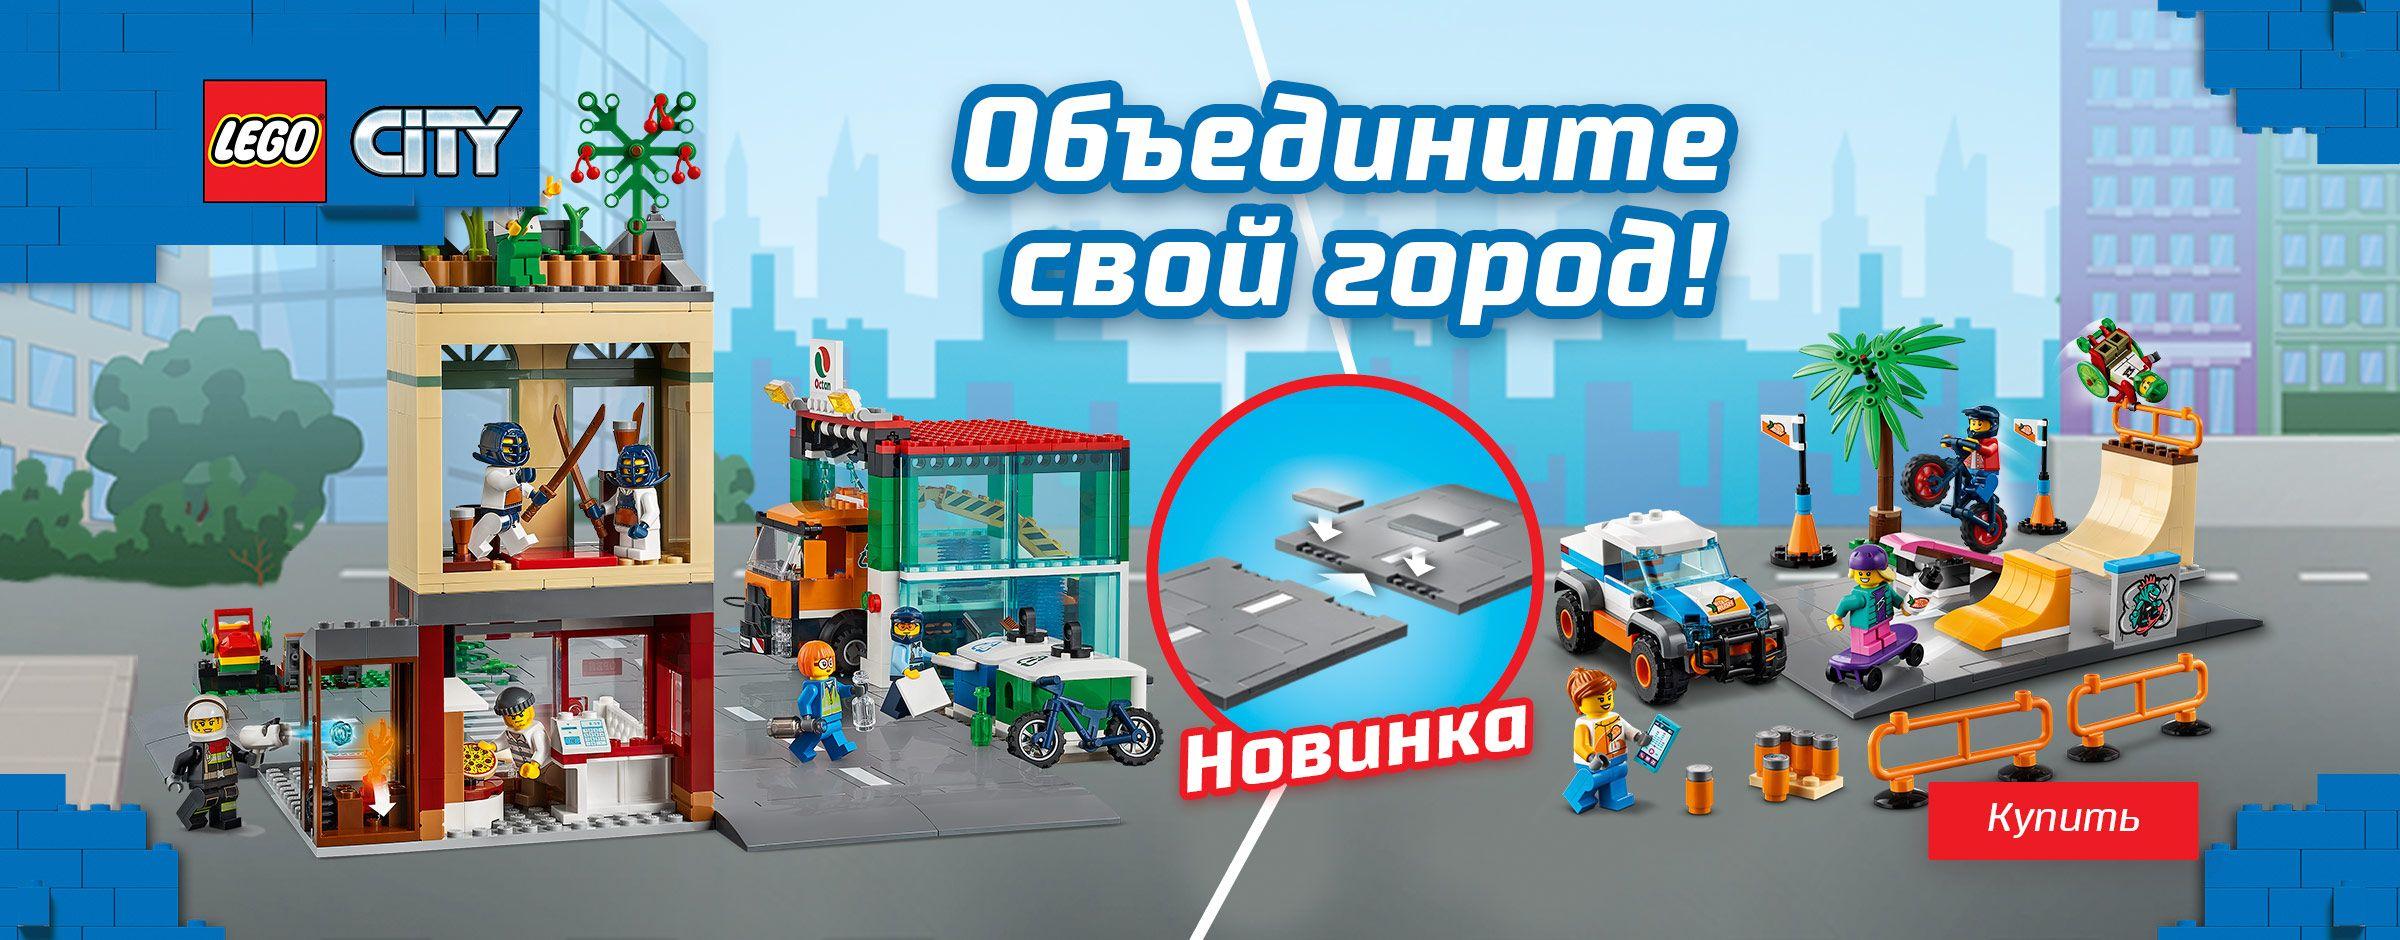 Lego City SIS